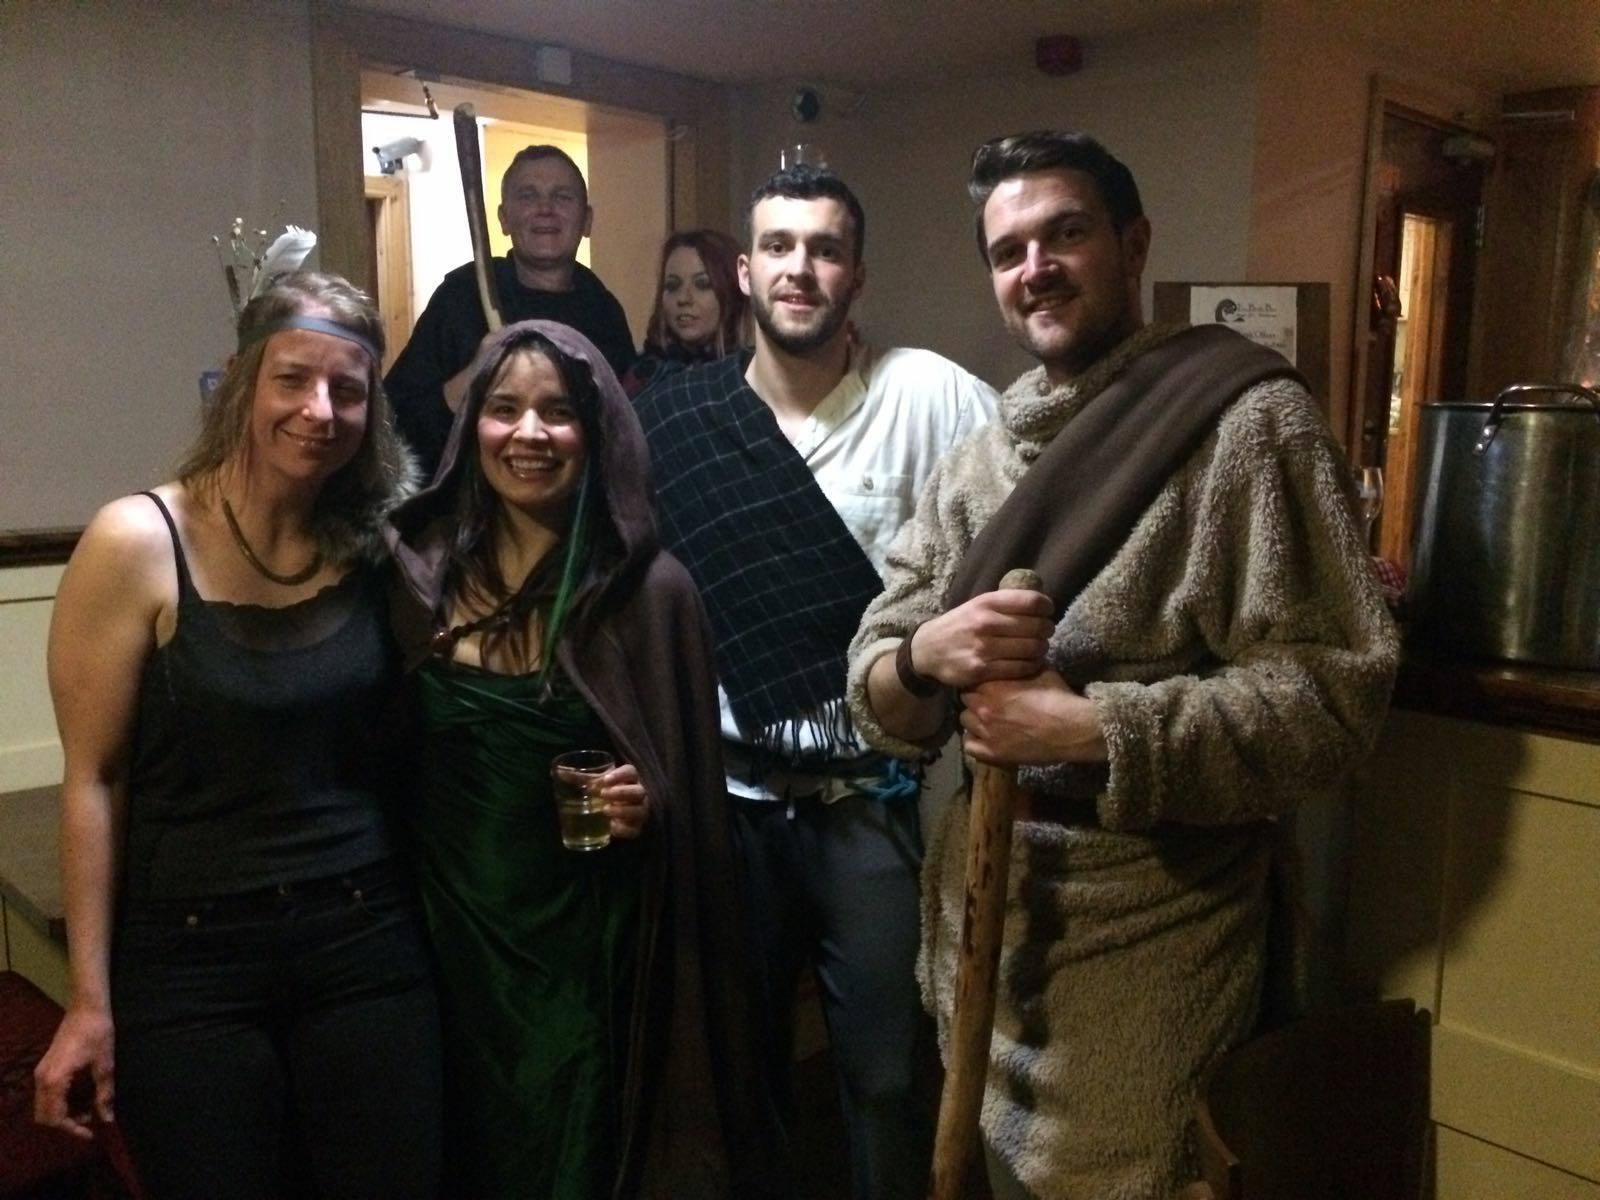 Celtic night ID Languages Bank bar Bundoran